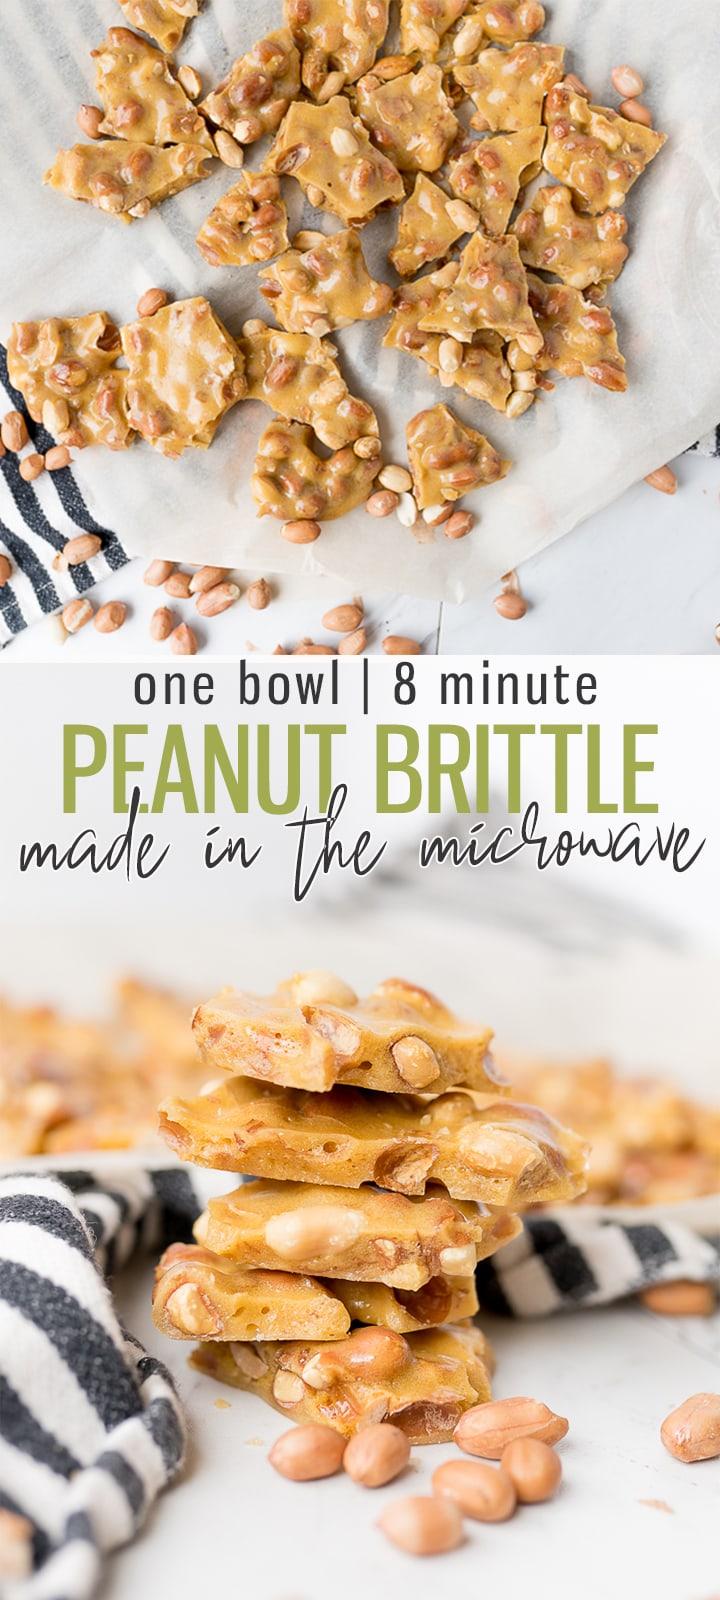 pin image for peanut brittle recipe